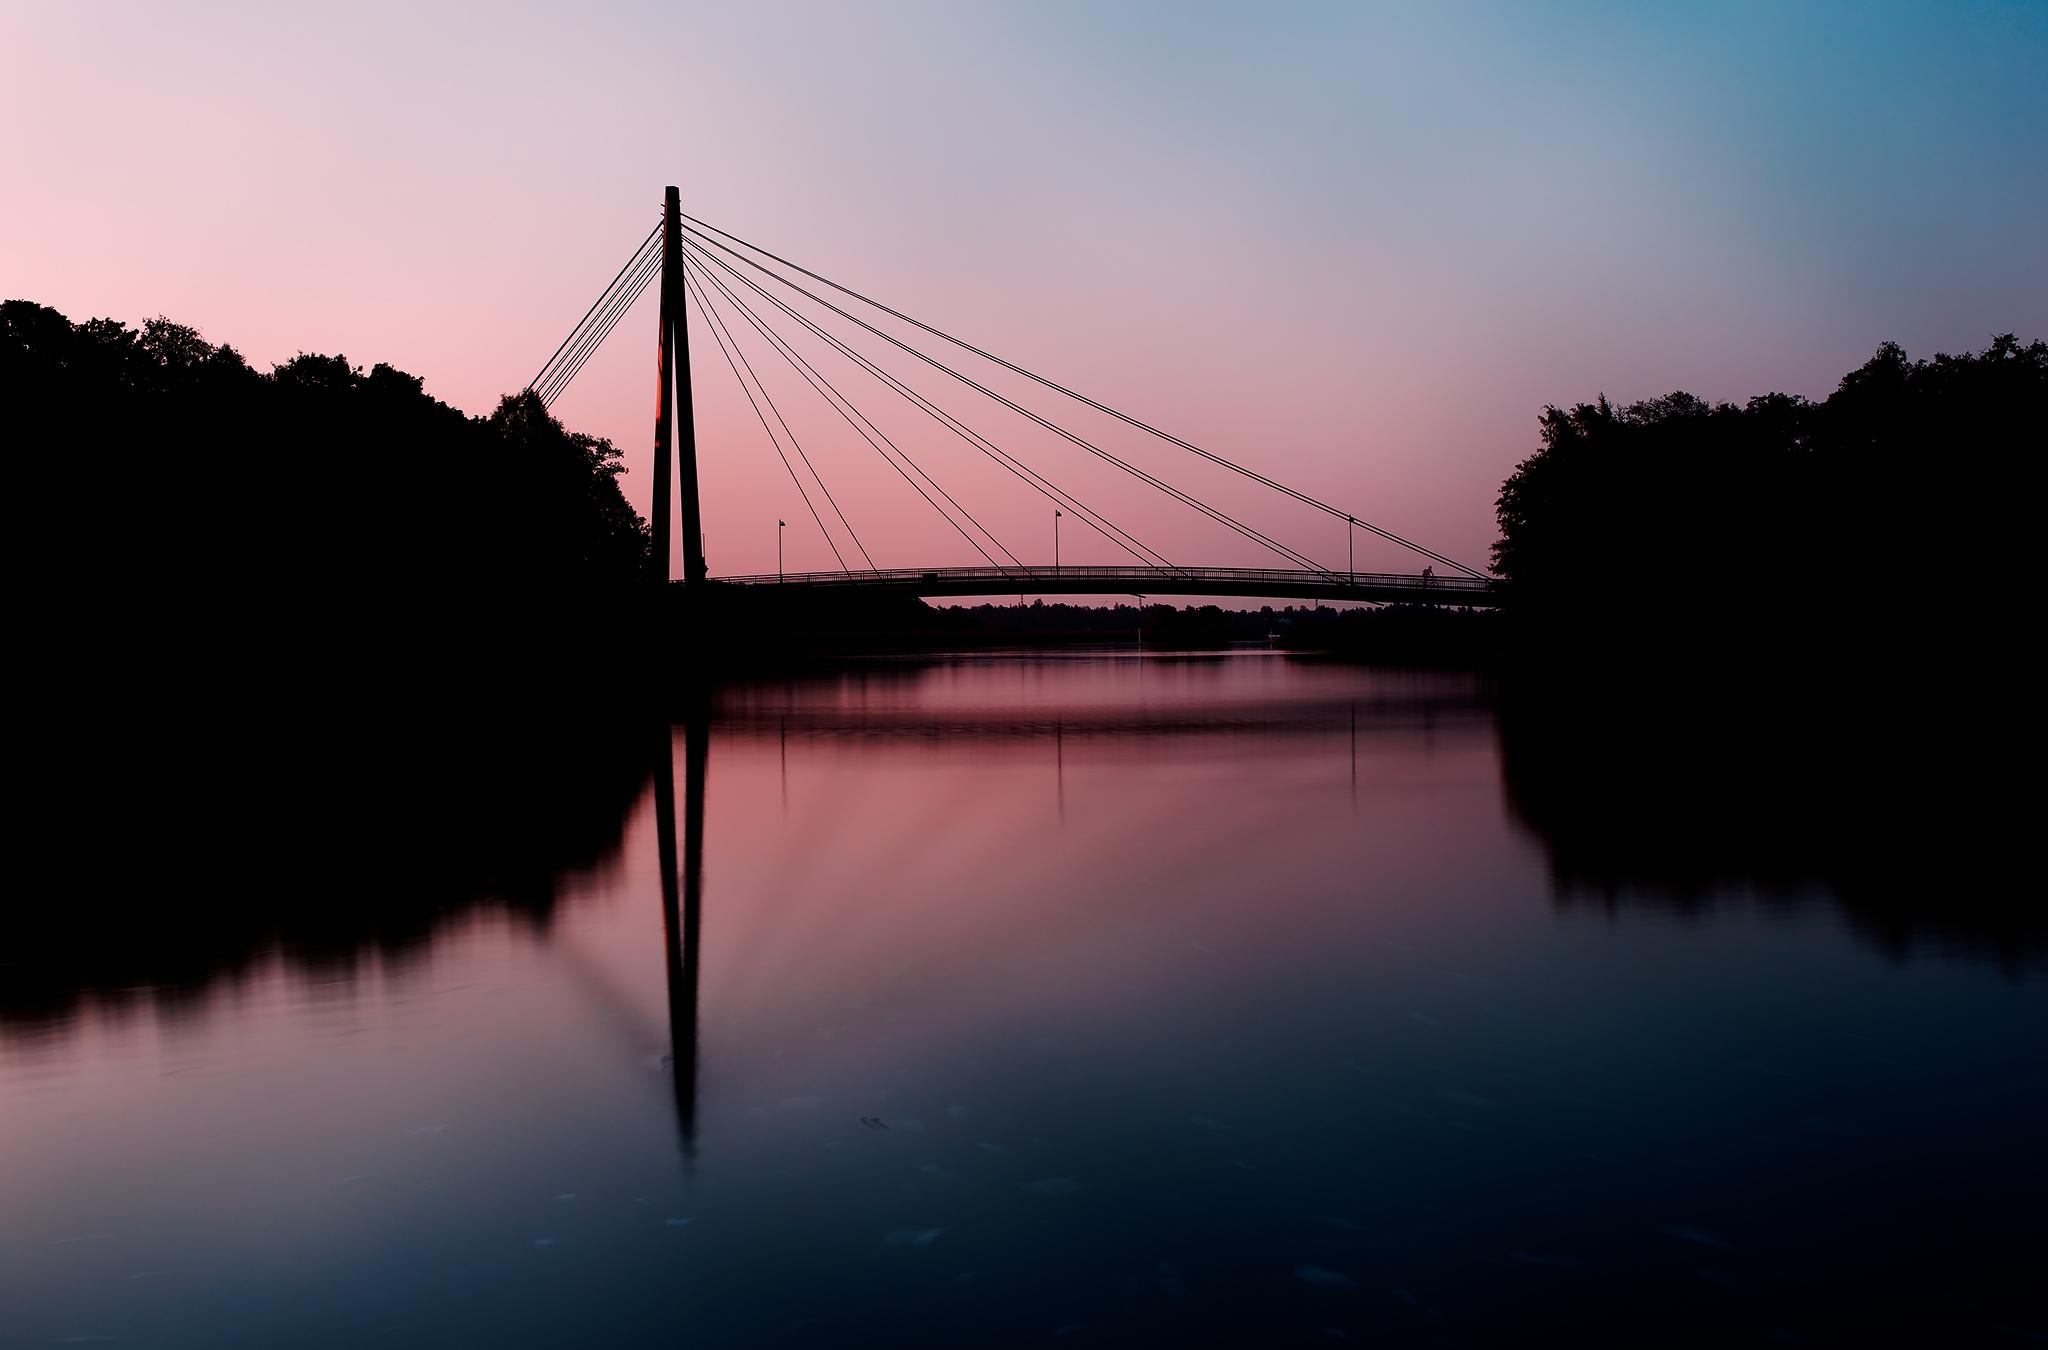 Helsinki Finland Suomi silta bridge